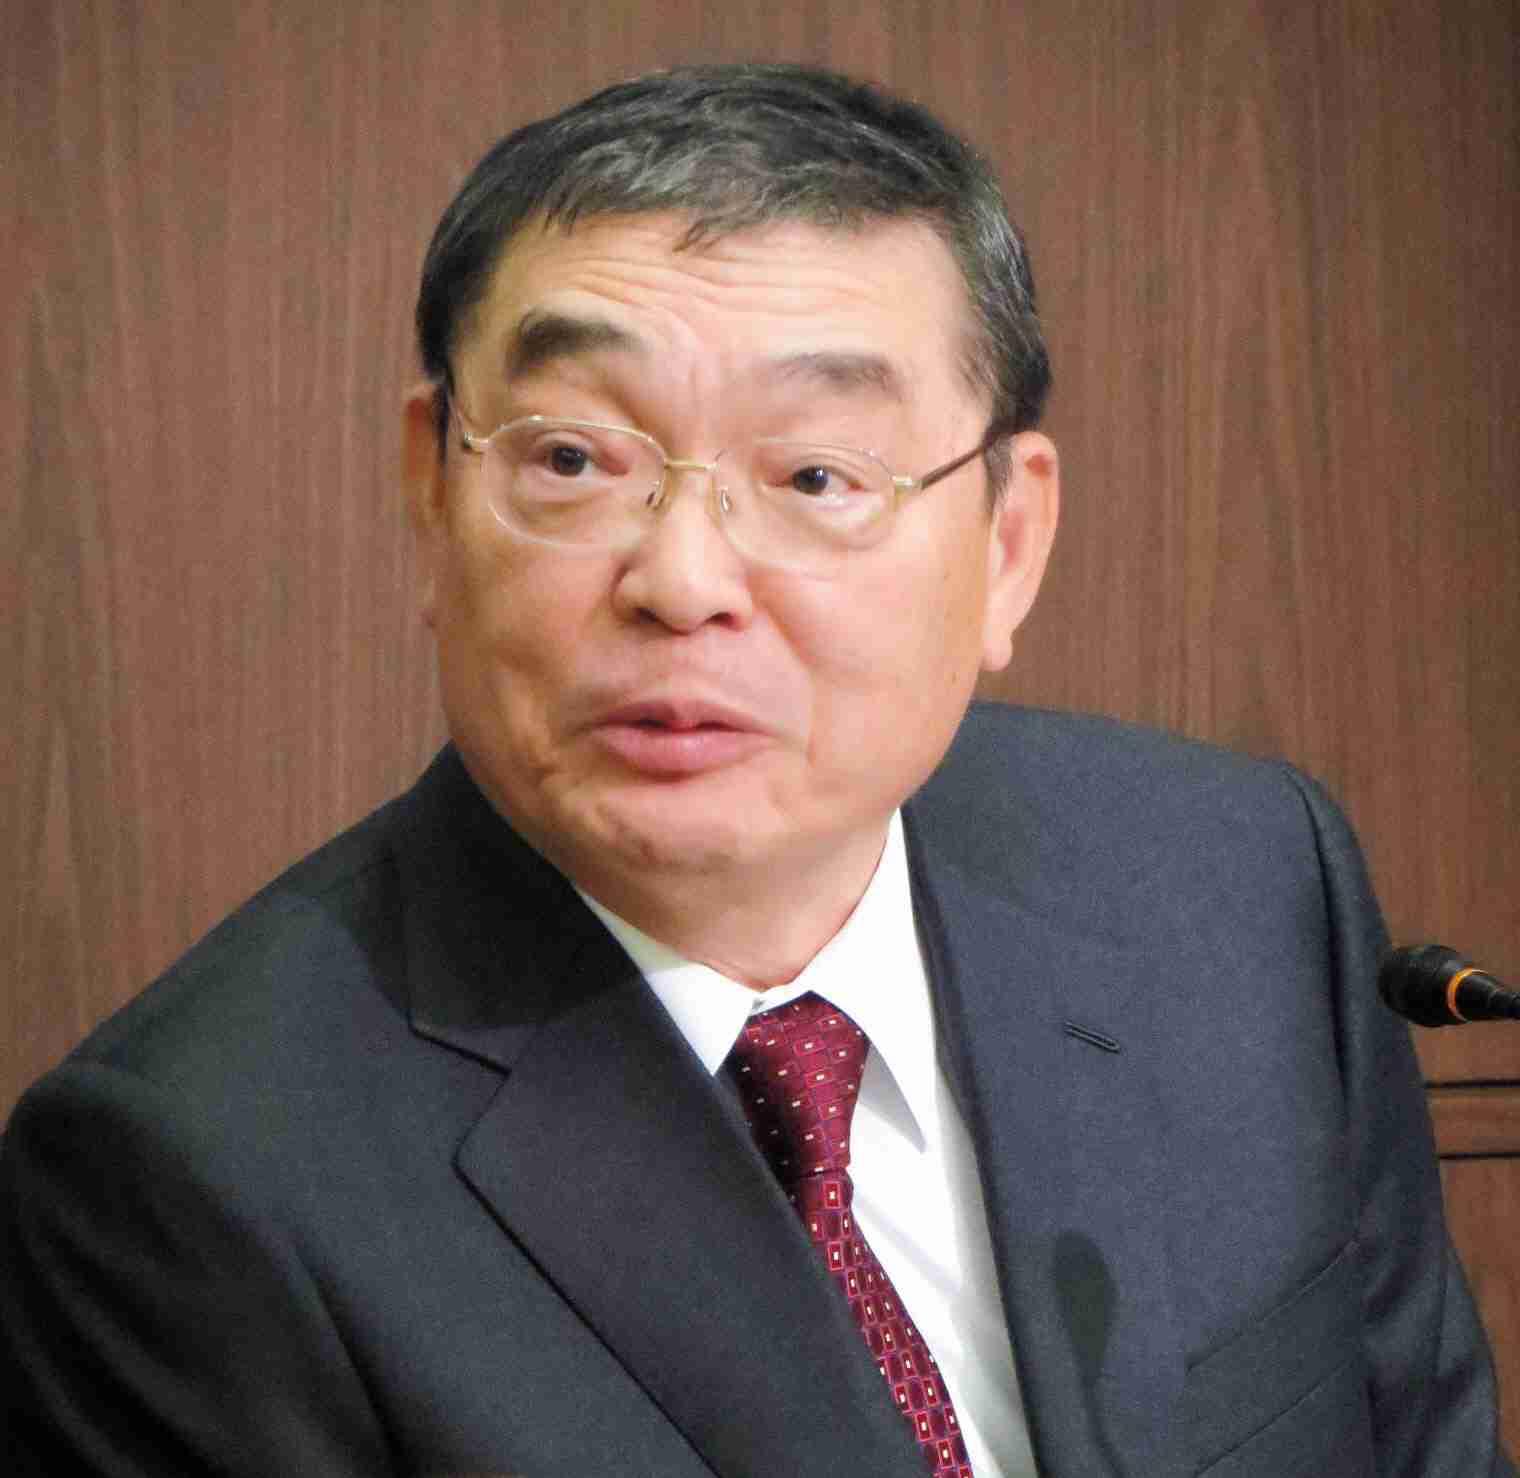 NHK籾井会長、受信料値下げを示唆 「お金が余ったら還元するのが原理原則」 (デイリースポーツ) - Yahoo!ニュース